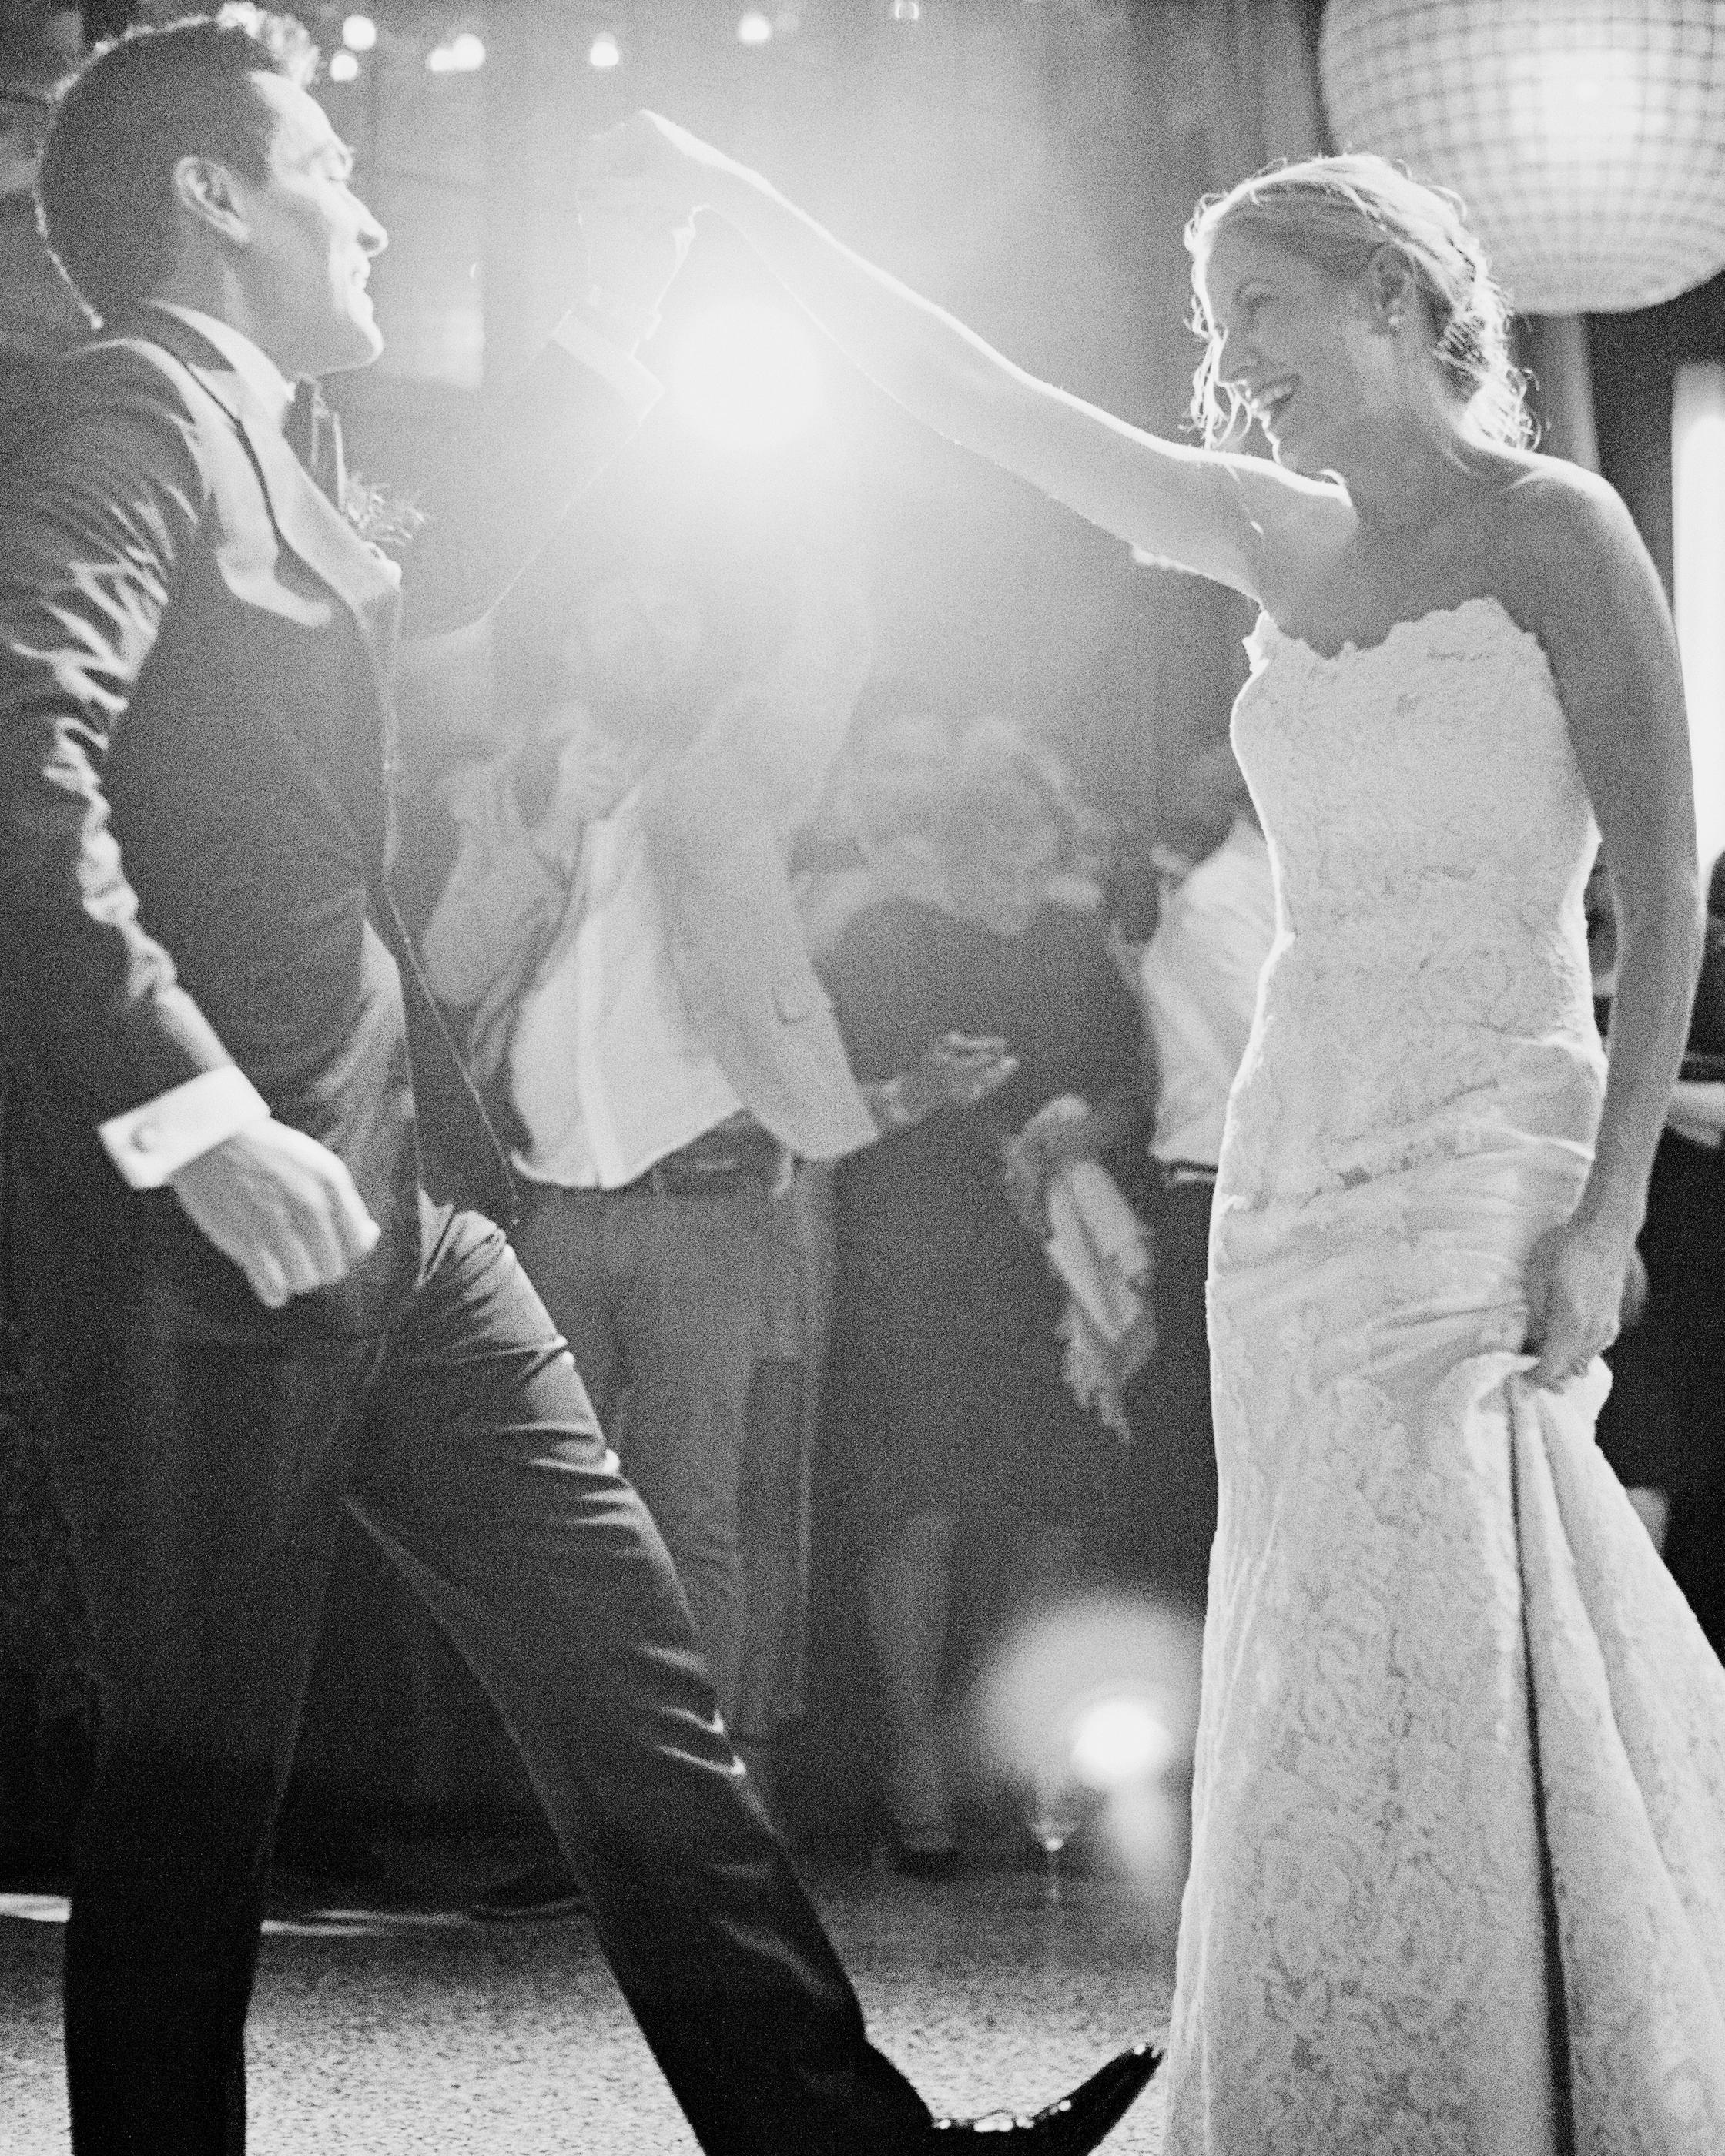 tina-raul-wedding-dance-0314.jpg